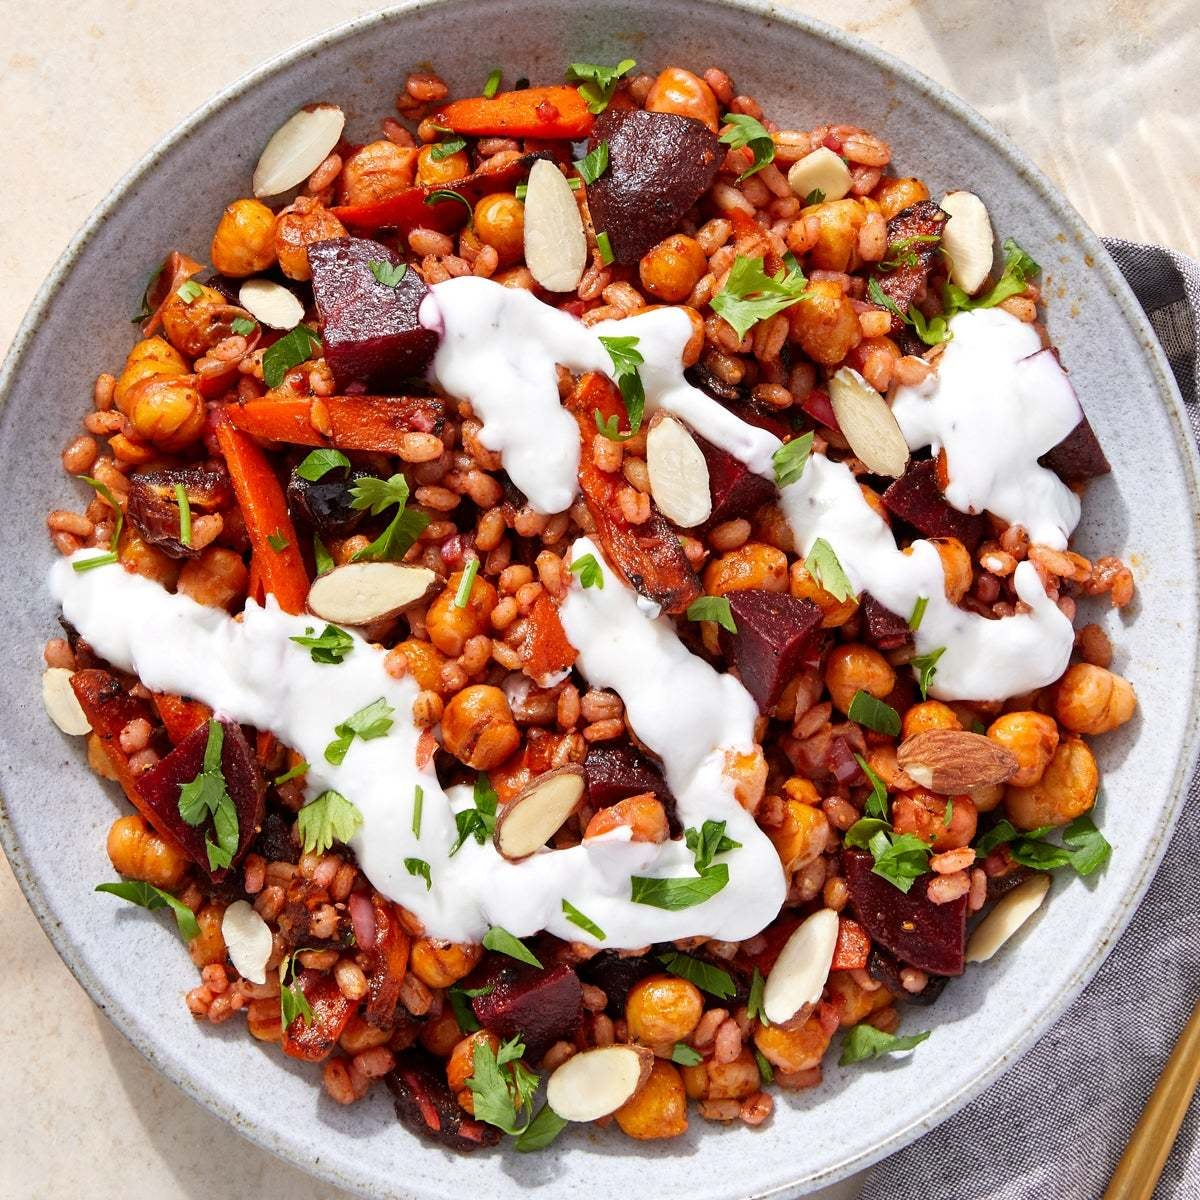 Mediterranean Chickpea Grain Bowls with Glazed Carrots, Dates & Lemon Yogurt